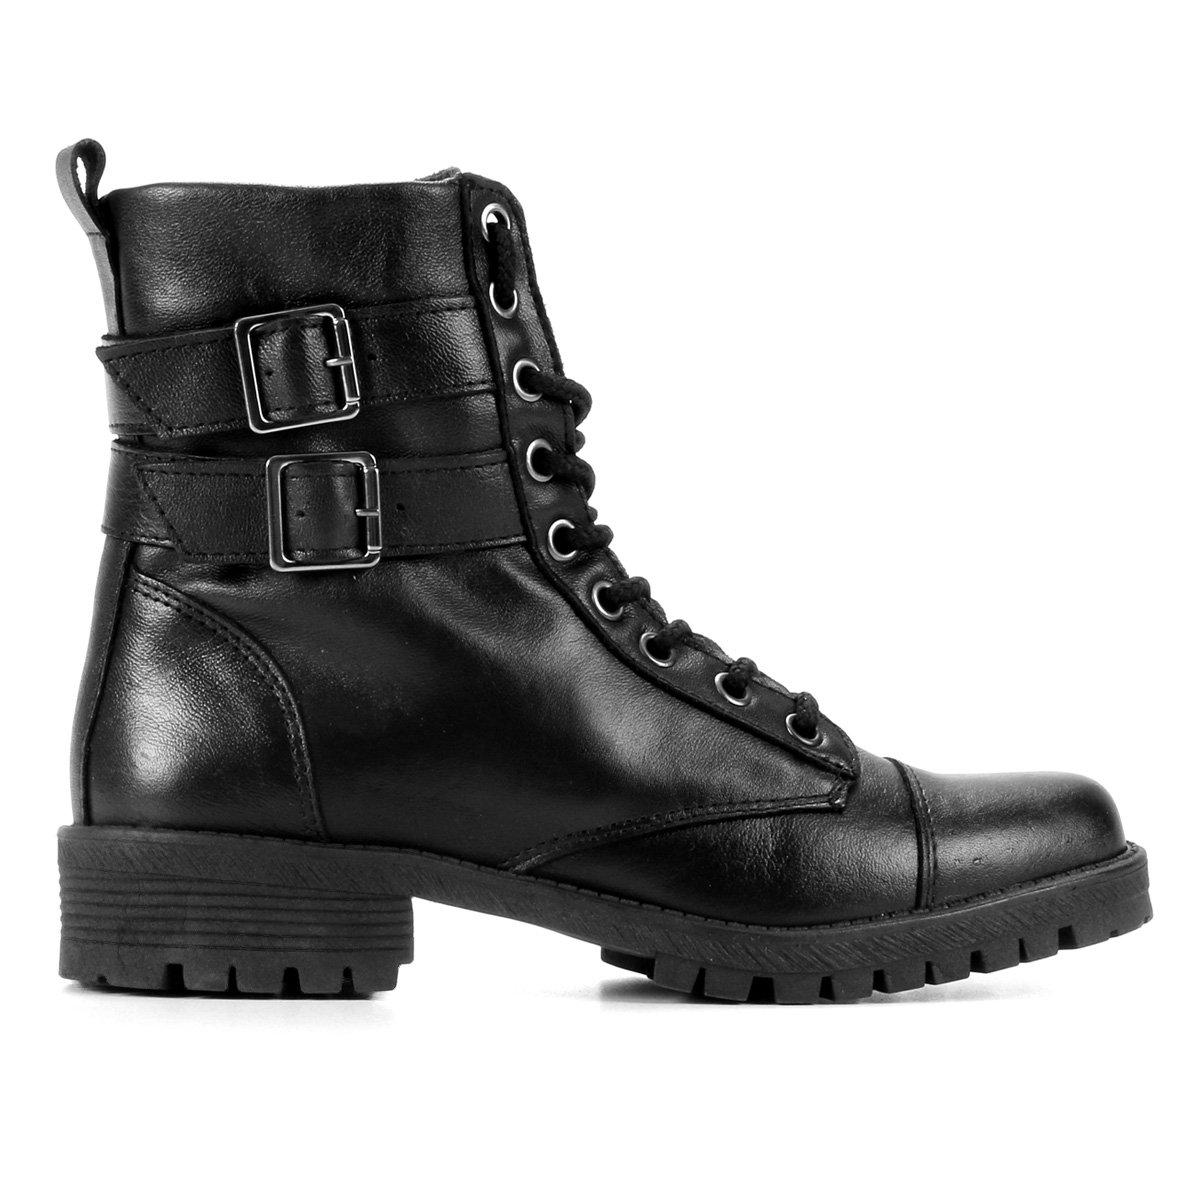 a8527500e Bota Coturno Shoestock Couro Fivelas Feminina - Preto | Shoestock